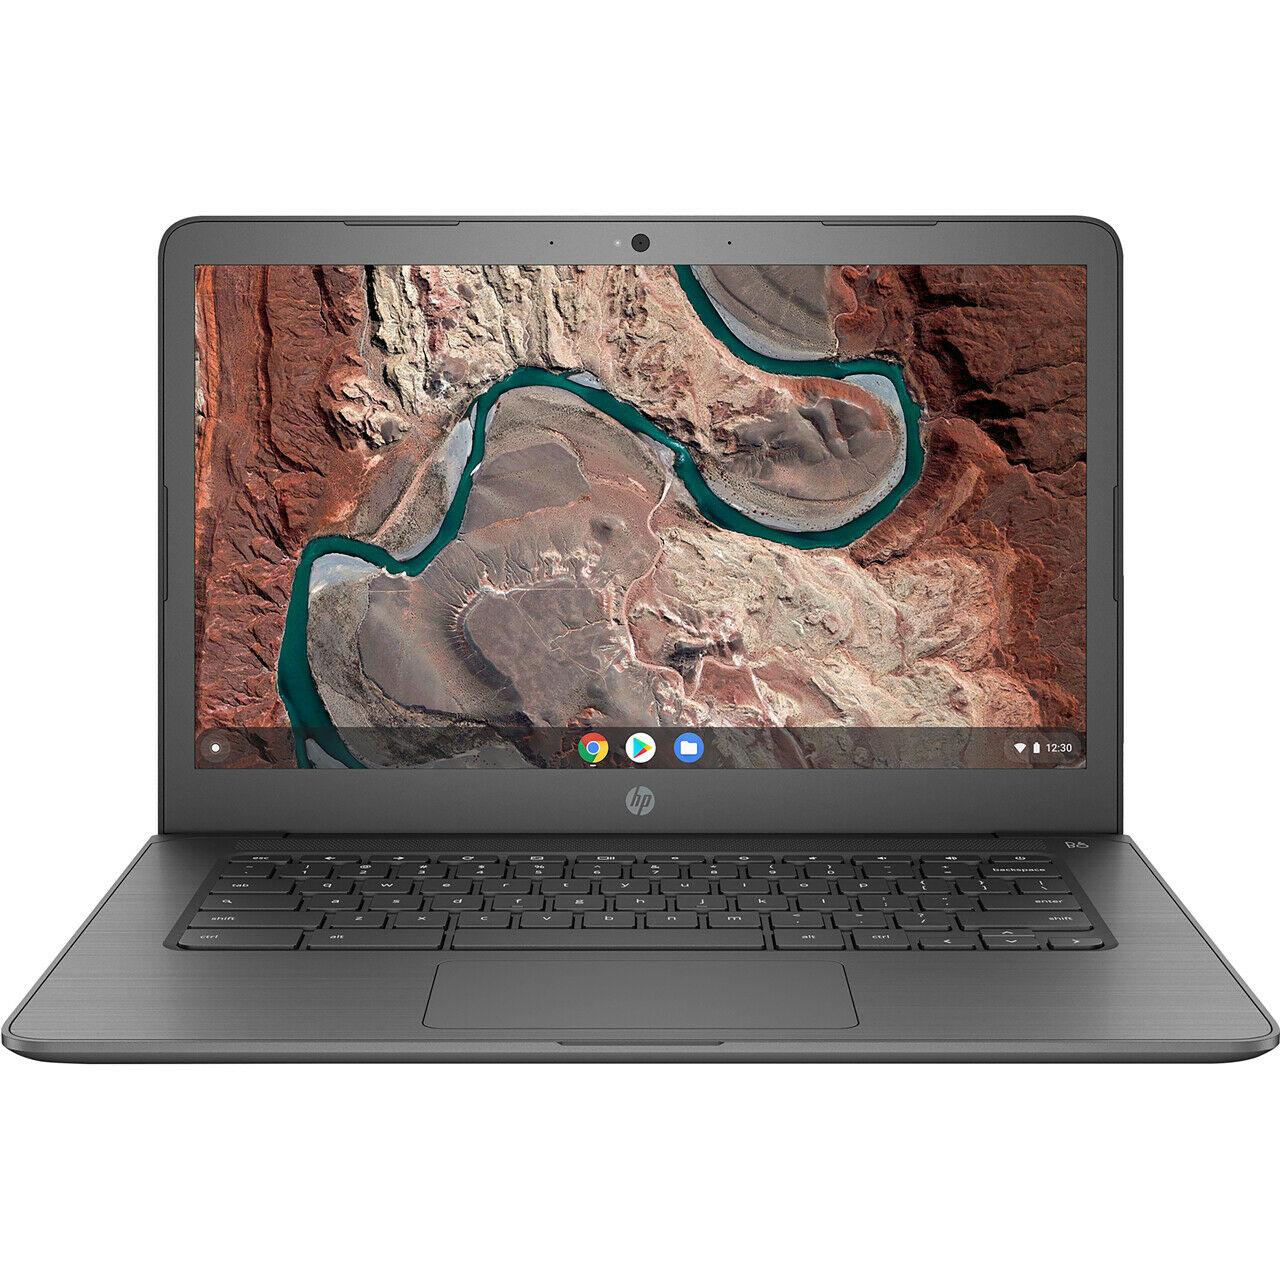 "Refurbished HP Chromebook 14-db0003na 14"" Laptop AMD A4-9120 4GB RAM & 32GB eMMC for £107.99 delivered (using code) @ eBay / Laptop Outlet"